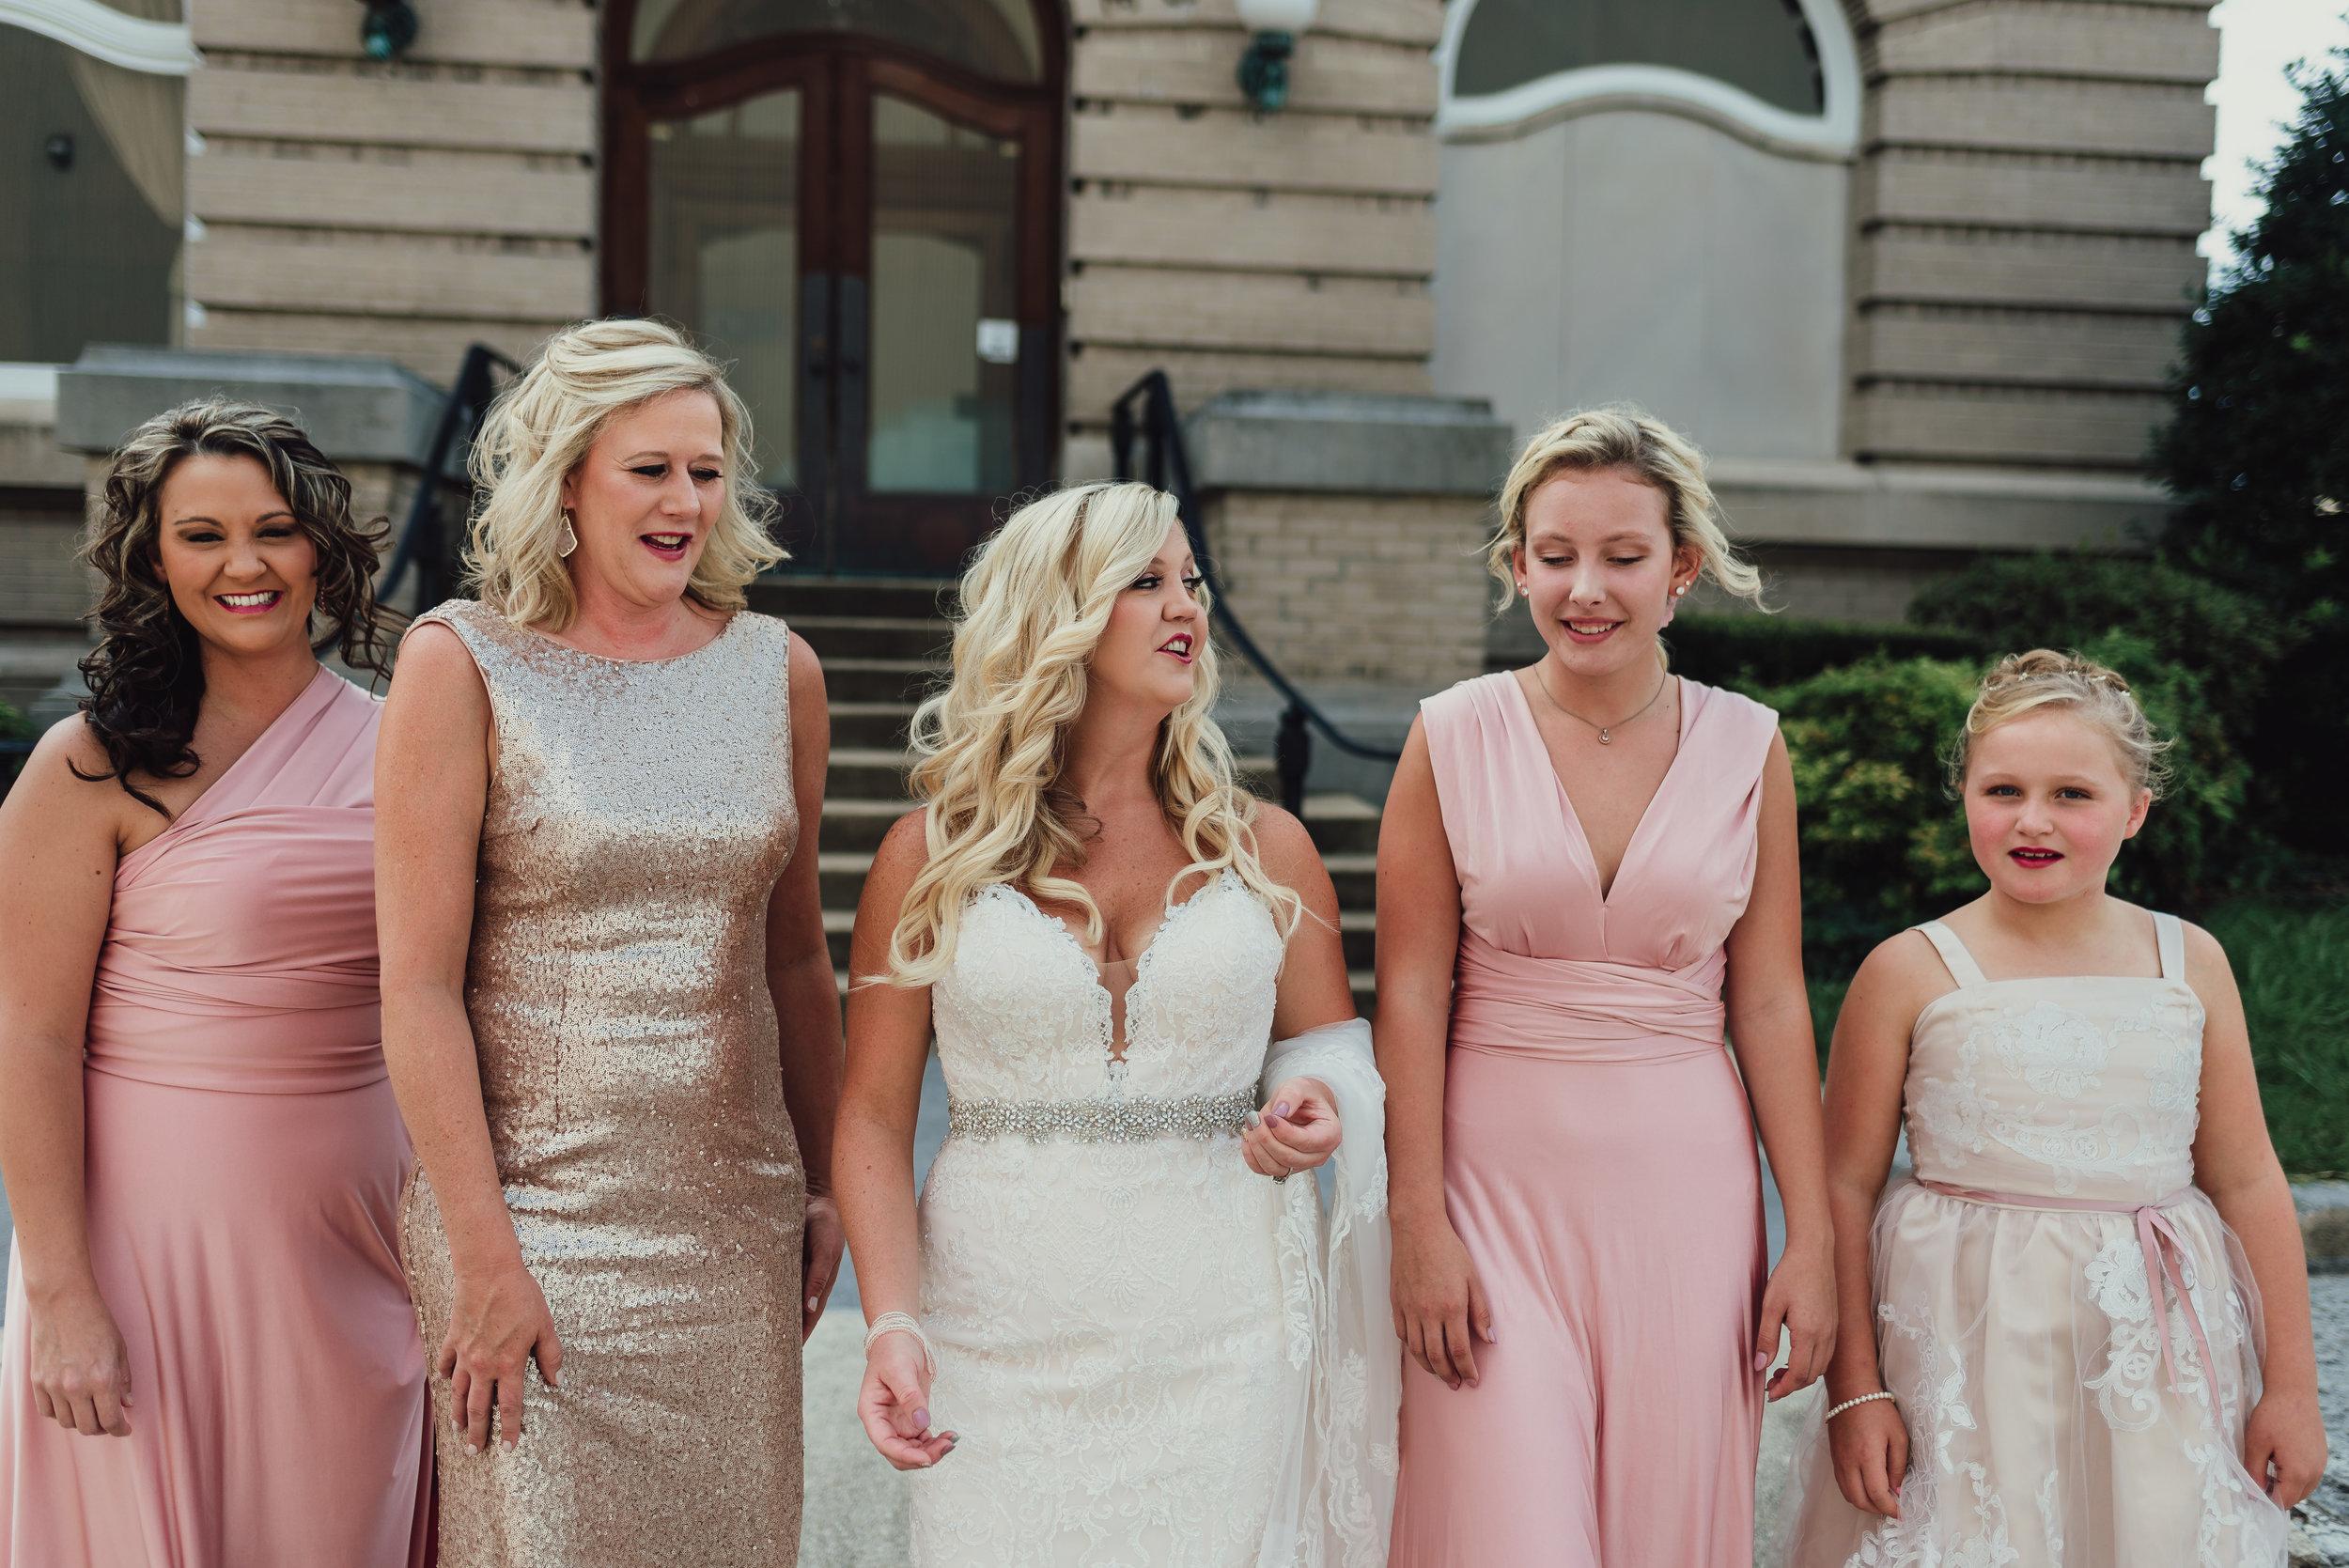 east-tn-wedding-photographer-tennessee-elopement-photographer-kingsport-tn-wedding-photographer (310 of 1001).jpg